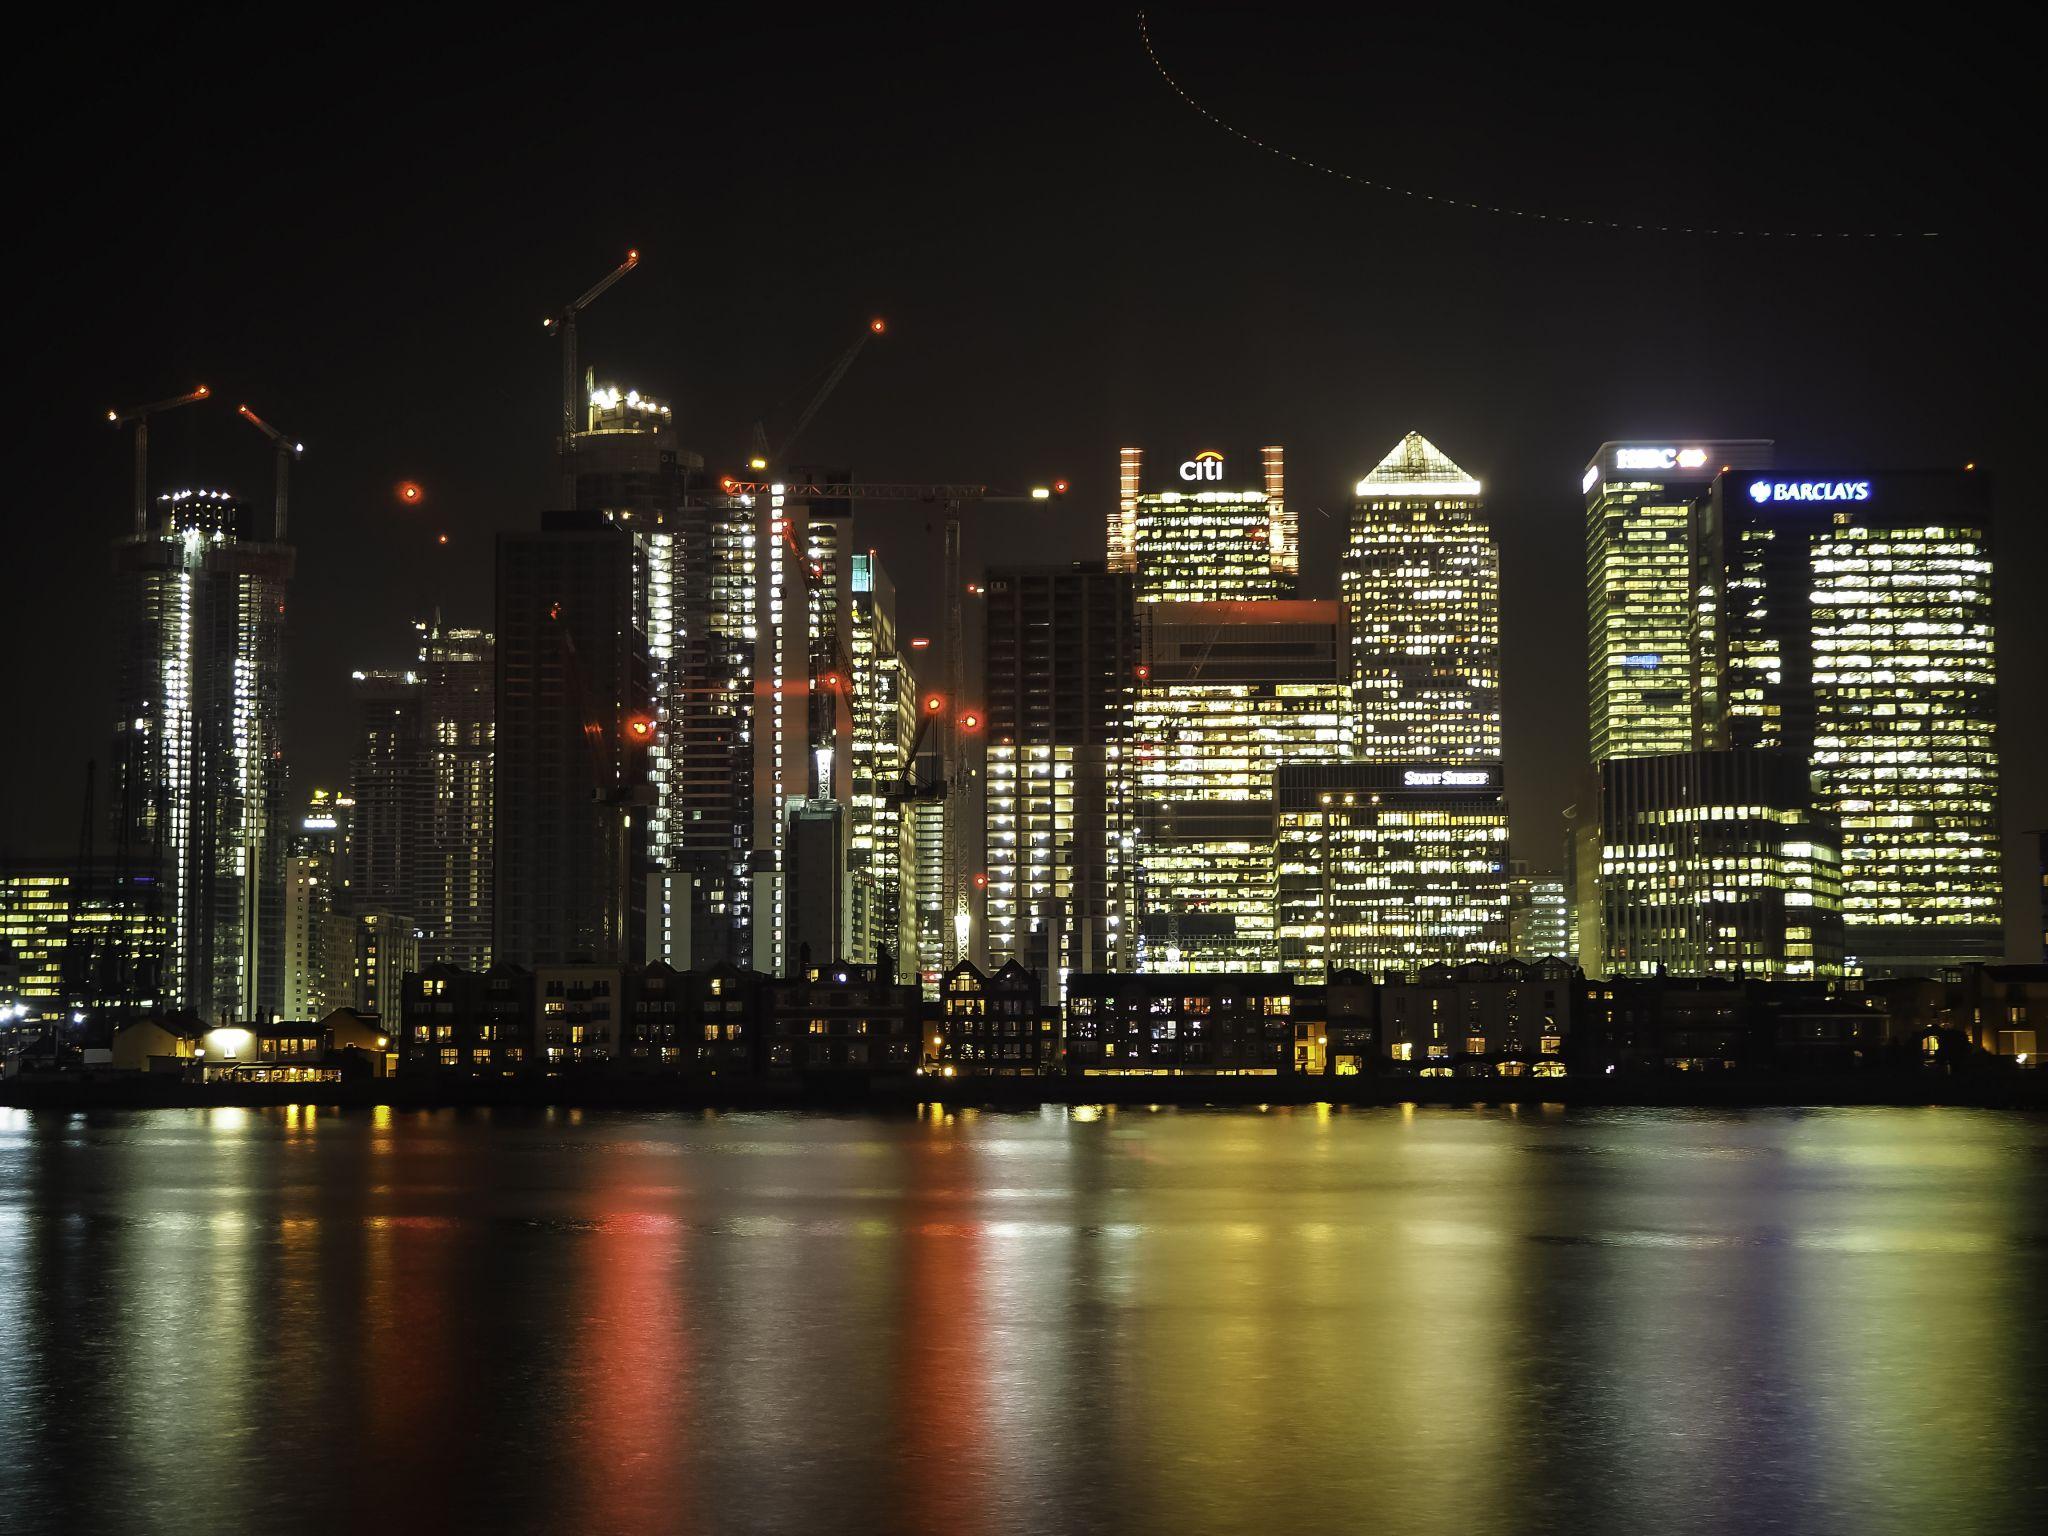 Canary Wharf, United Kingdom